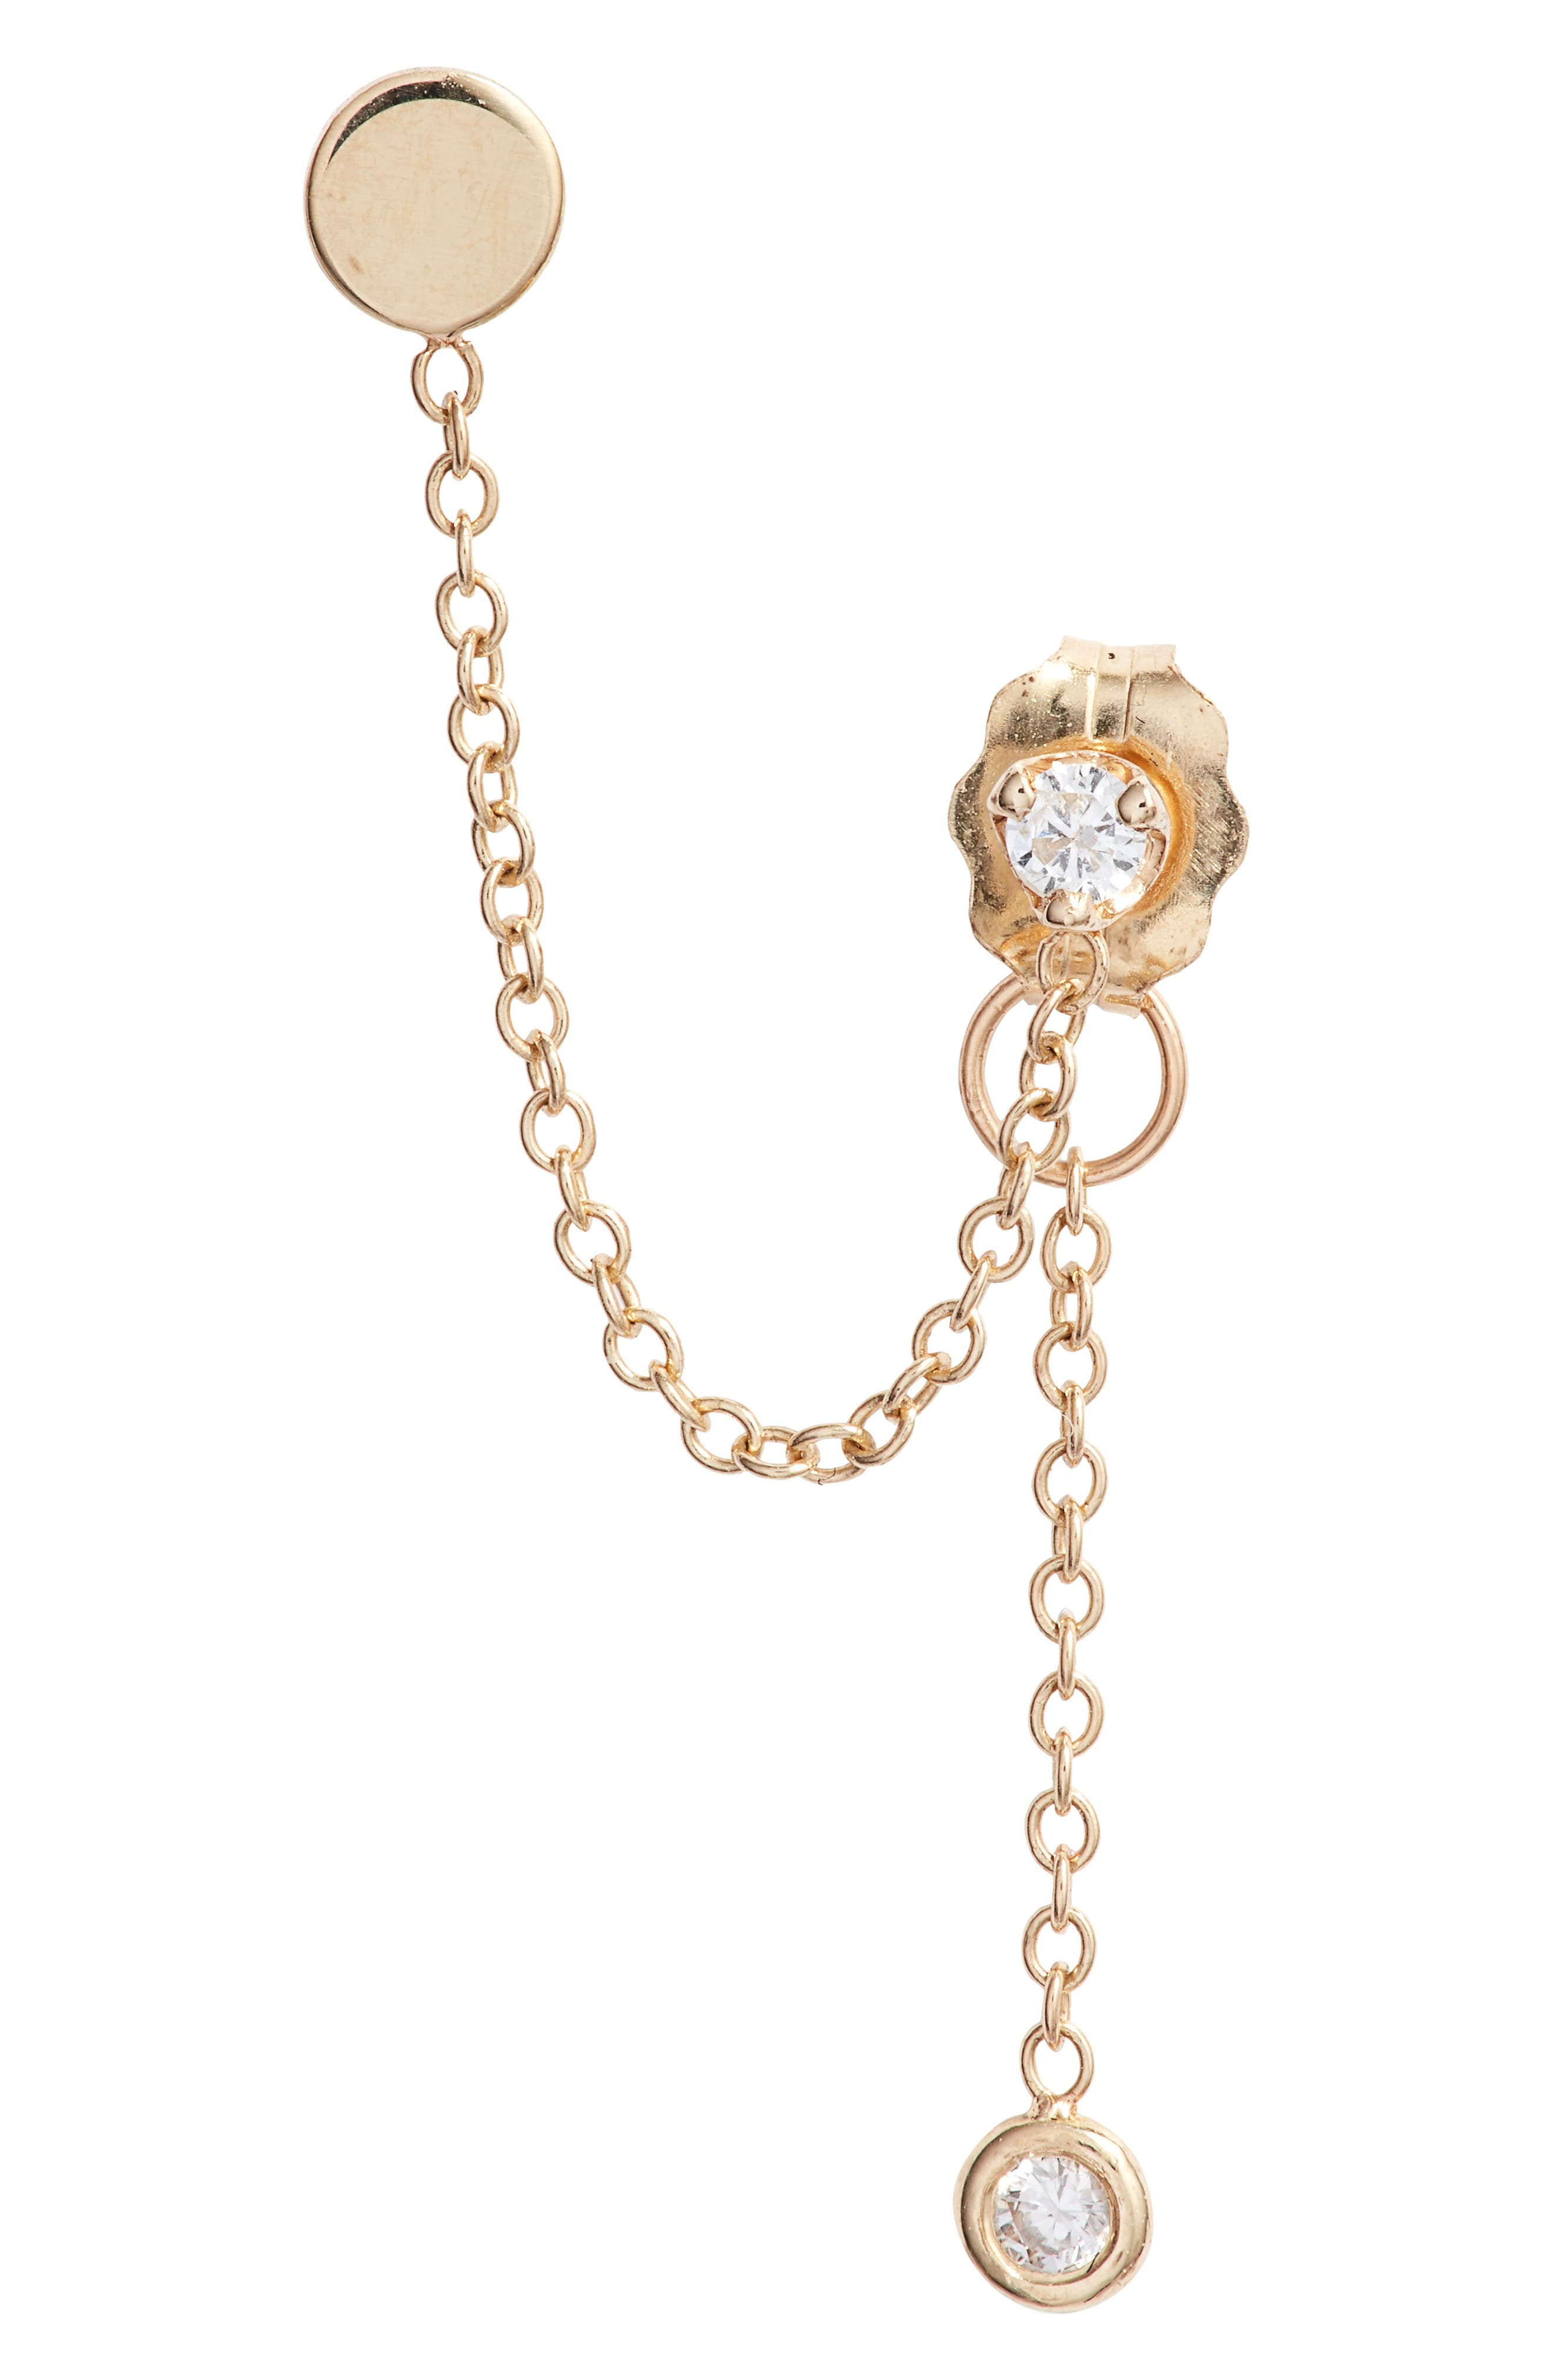 Zoe Chicco Itty Bitty Single Diamond Earring Chain